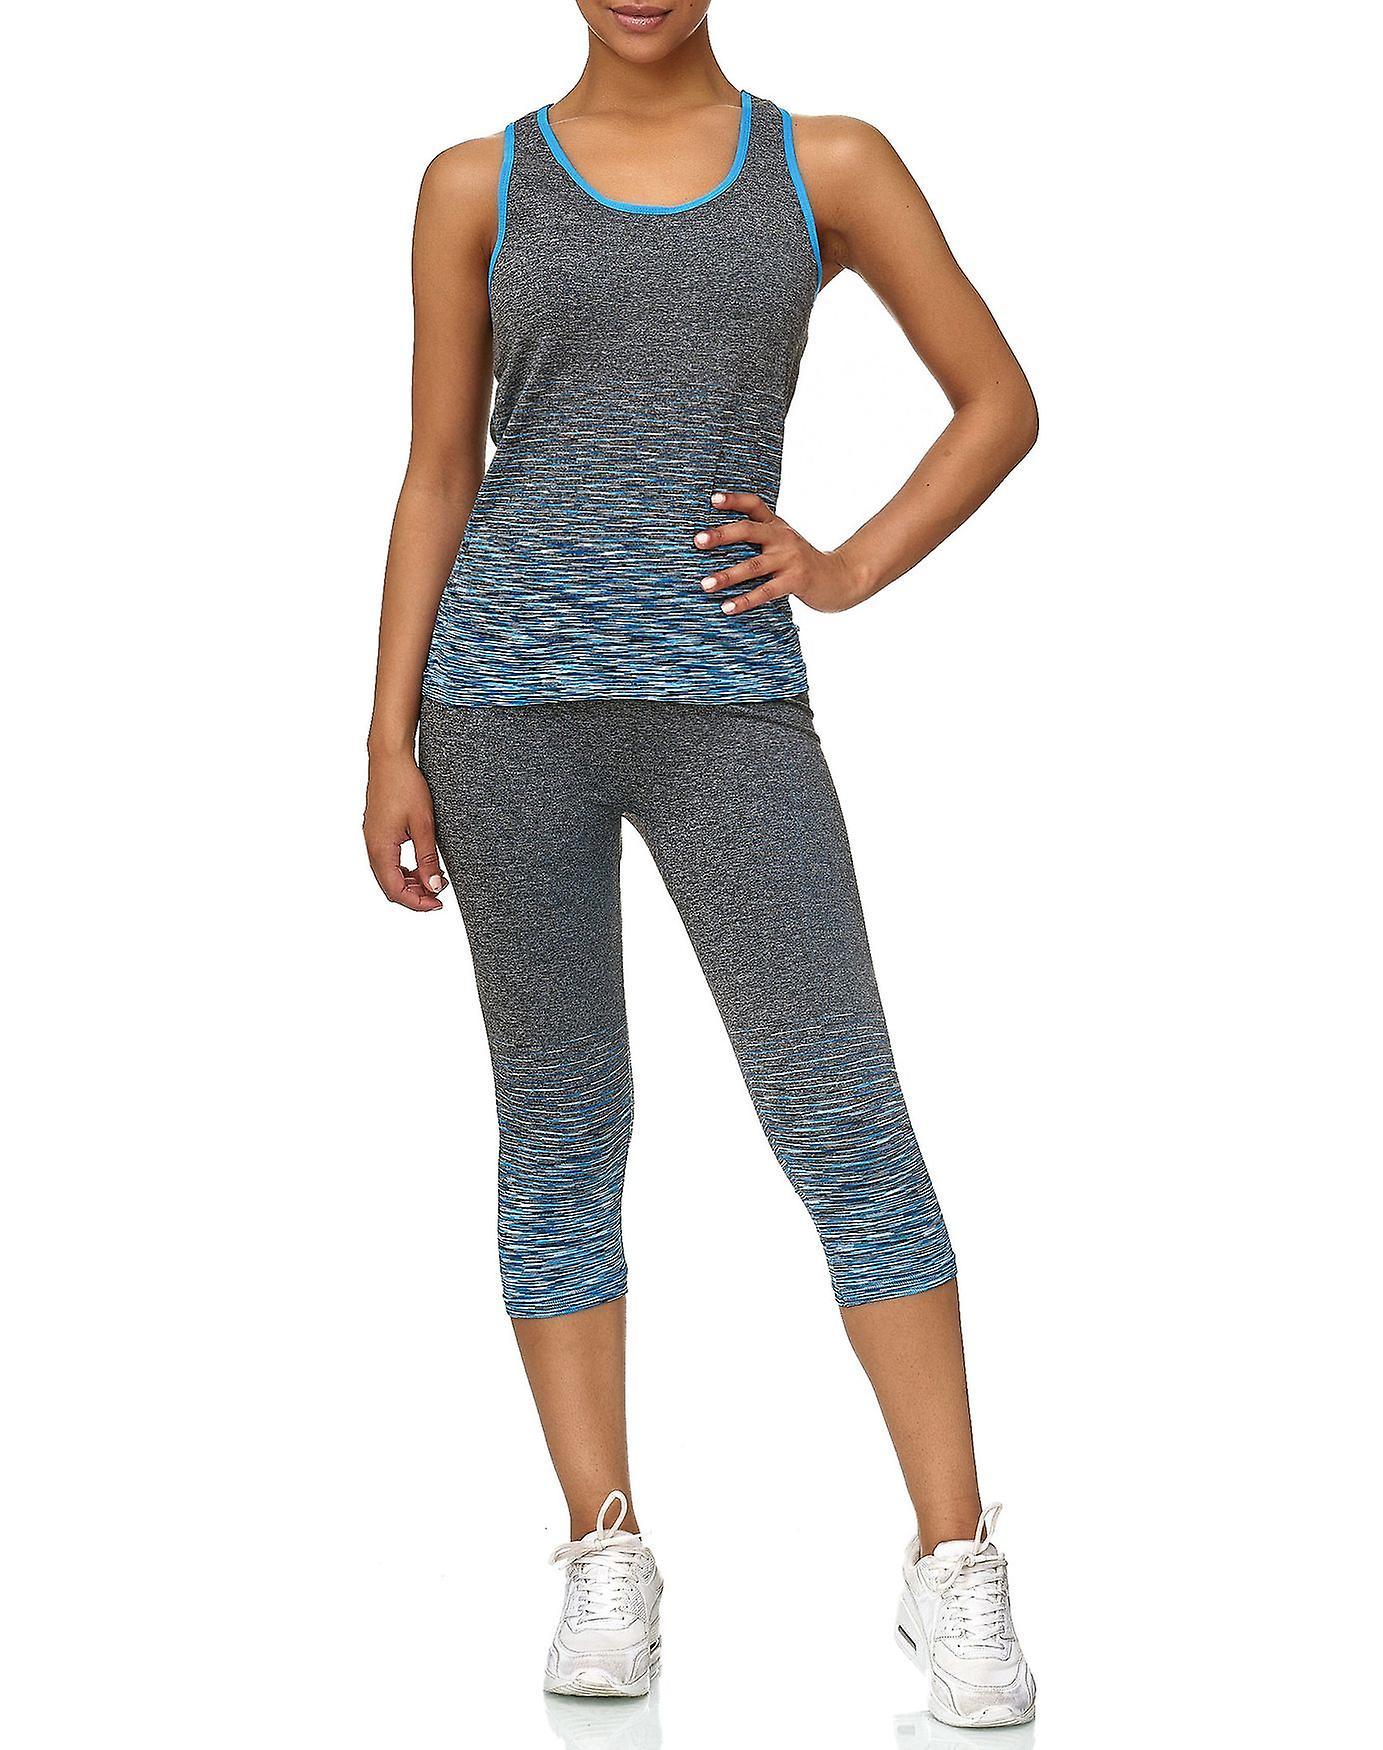 68049a4912986 Ladies Sport Set GYM Fitness Shirt Leggings Training Pants Two Piece  Workout Top